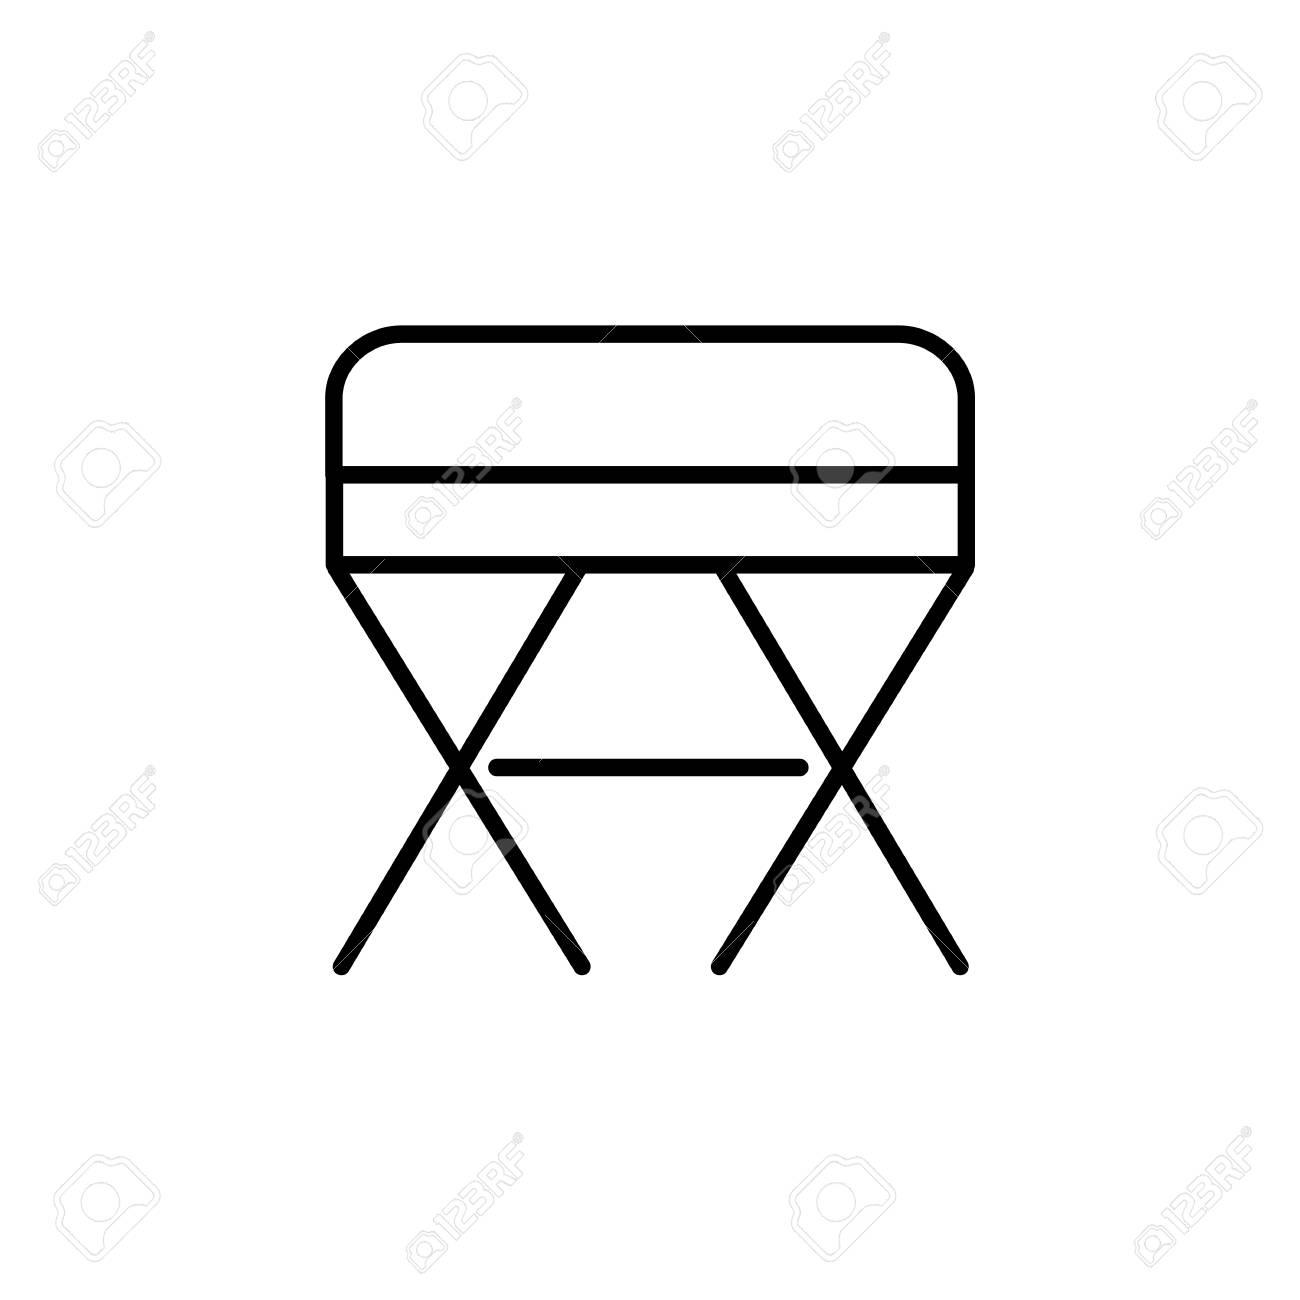 Phenomenal Black White Vector Illustration Of Square Ottoman Pouf Line Evergreenethics Interior Chair Design Evergreenethicsorg